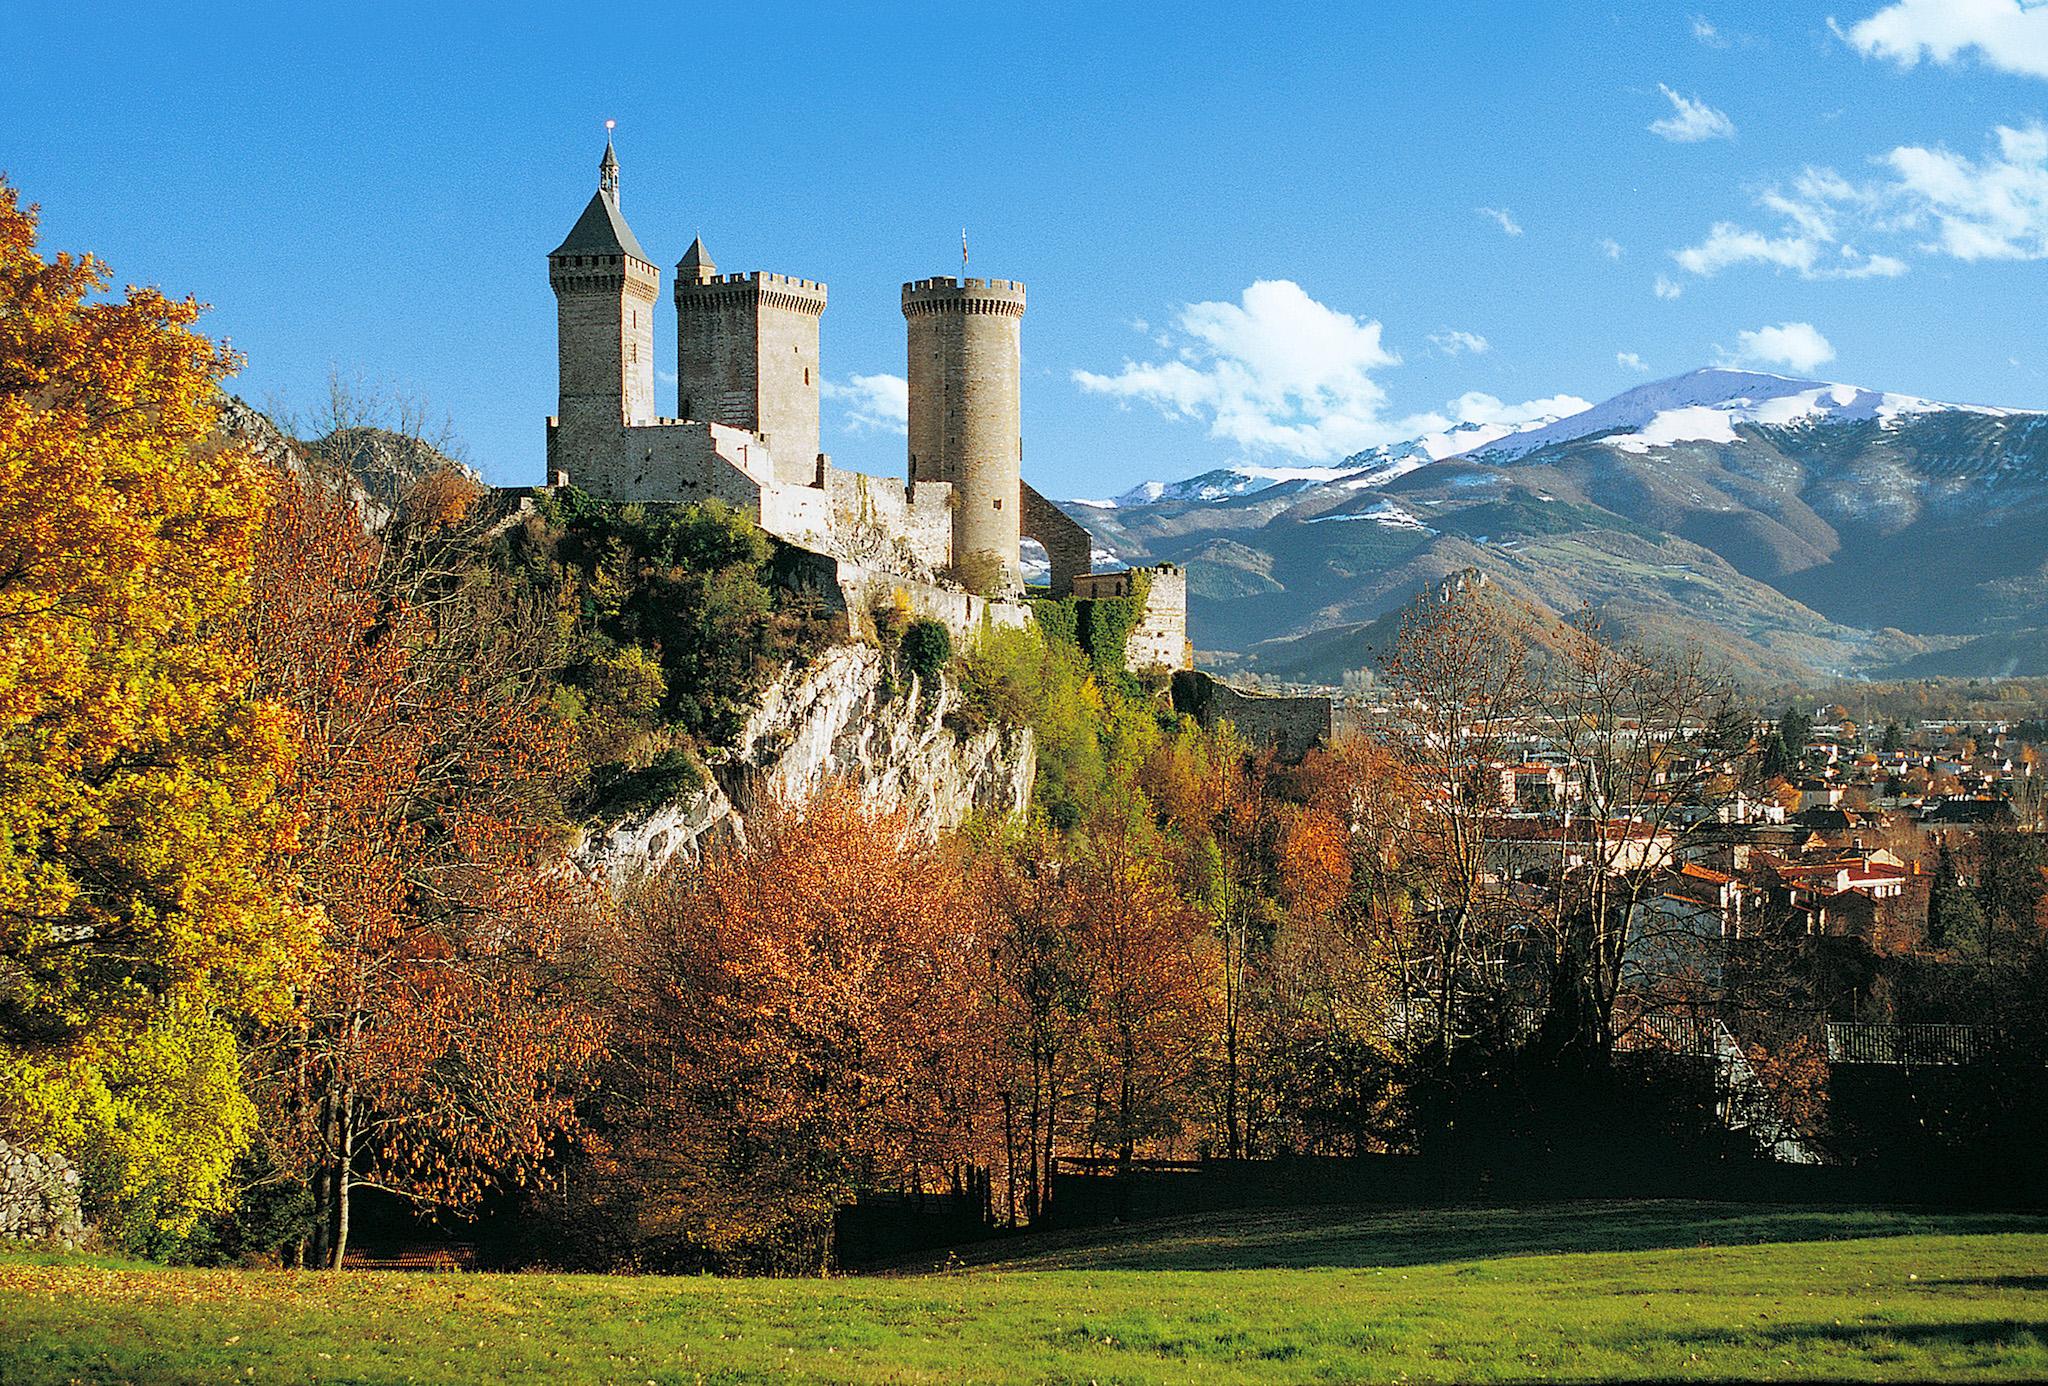 London to Barcelona via Latour-de-Carol & the Pyrenees